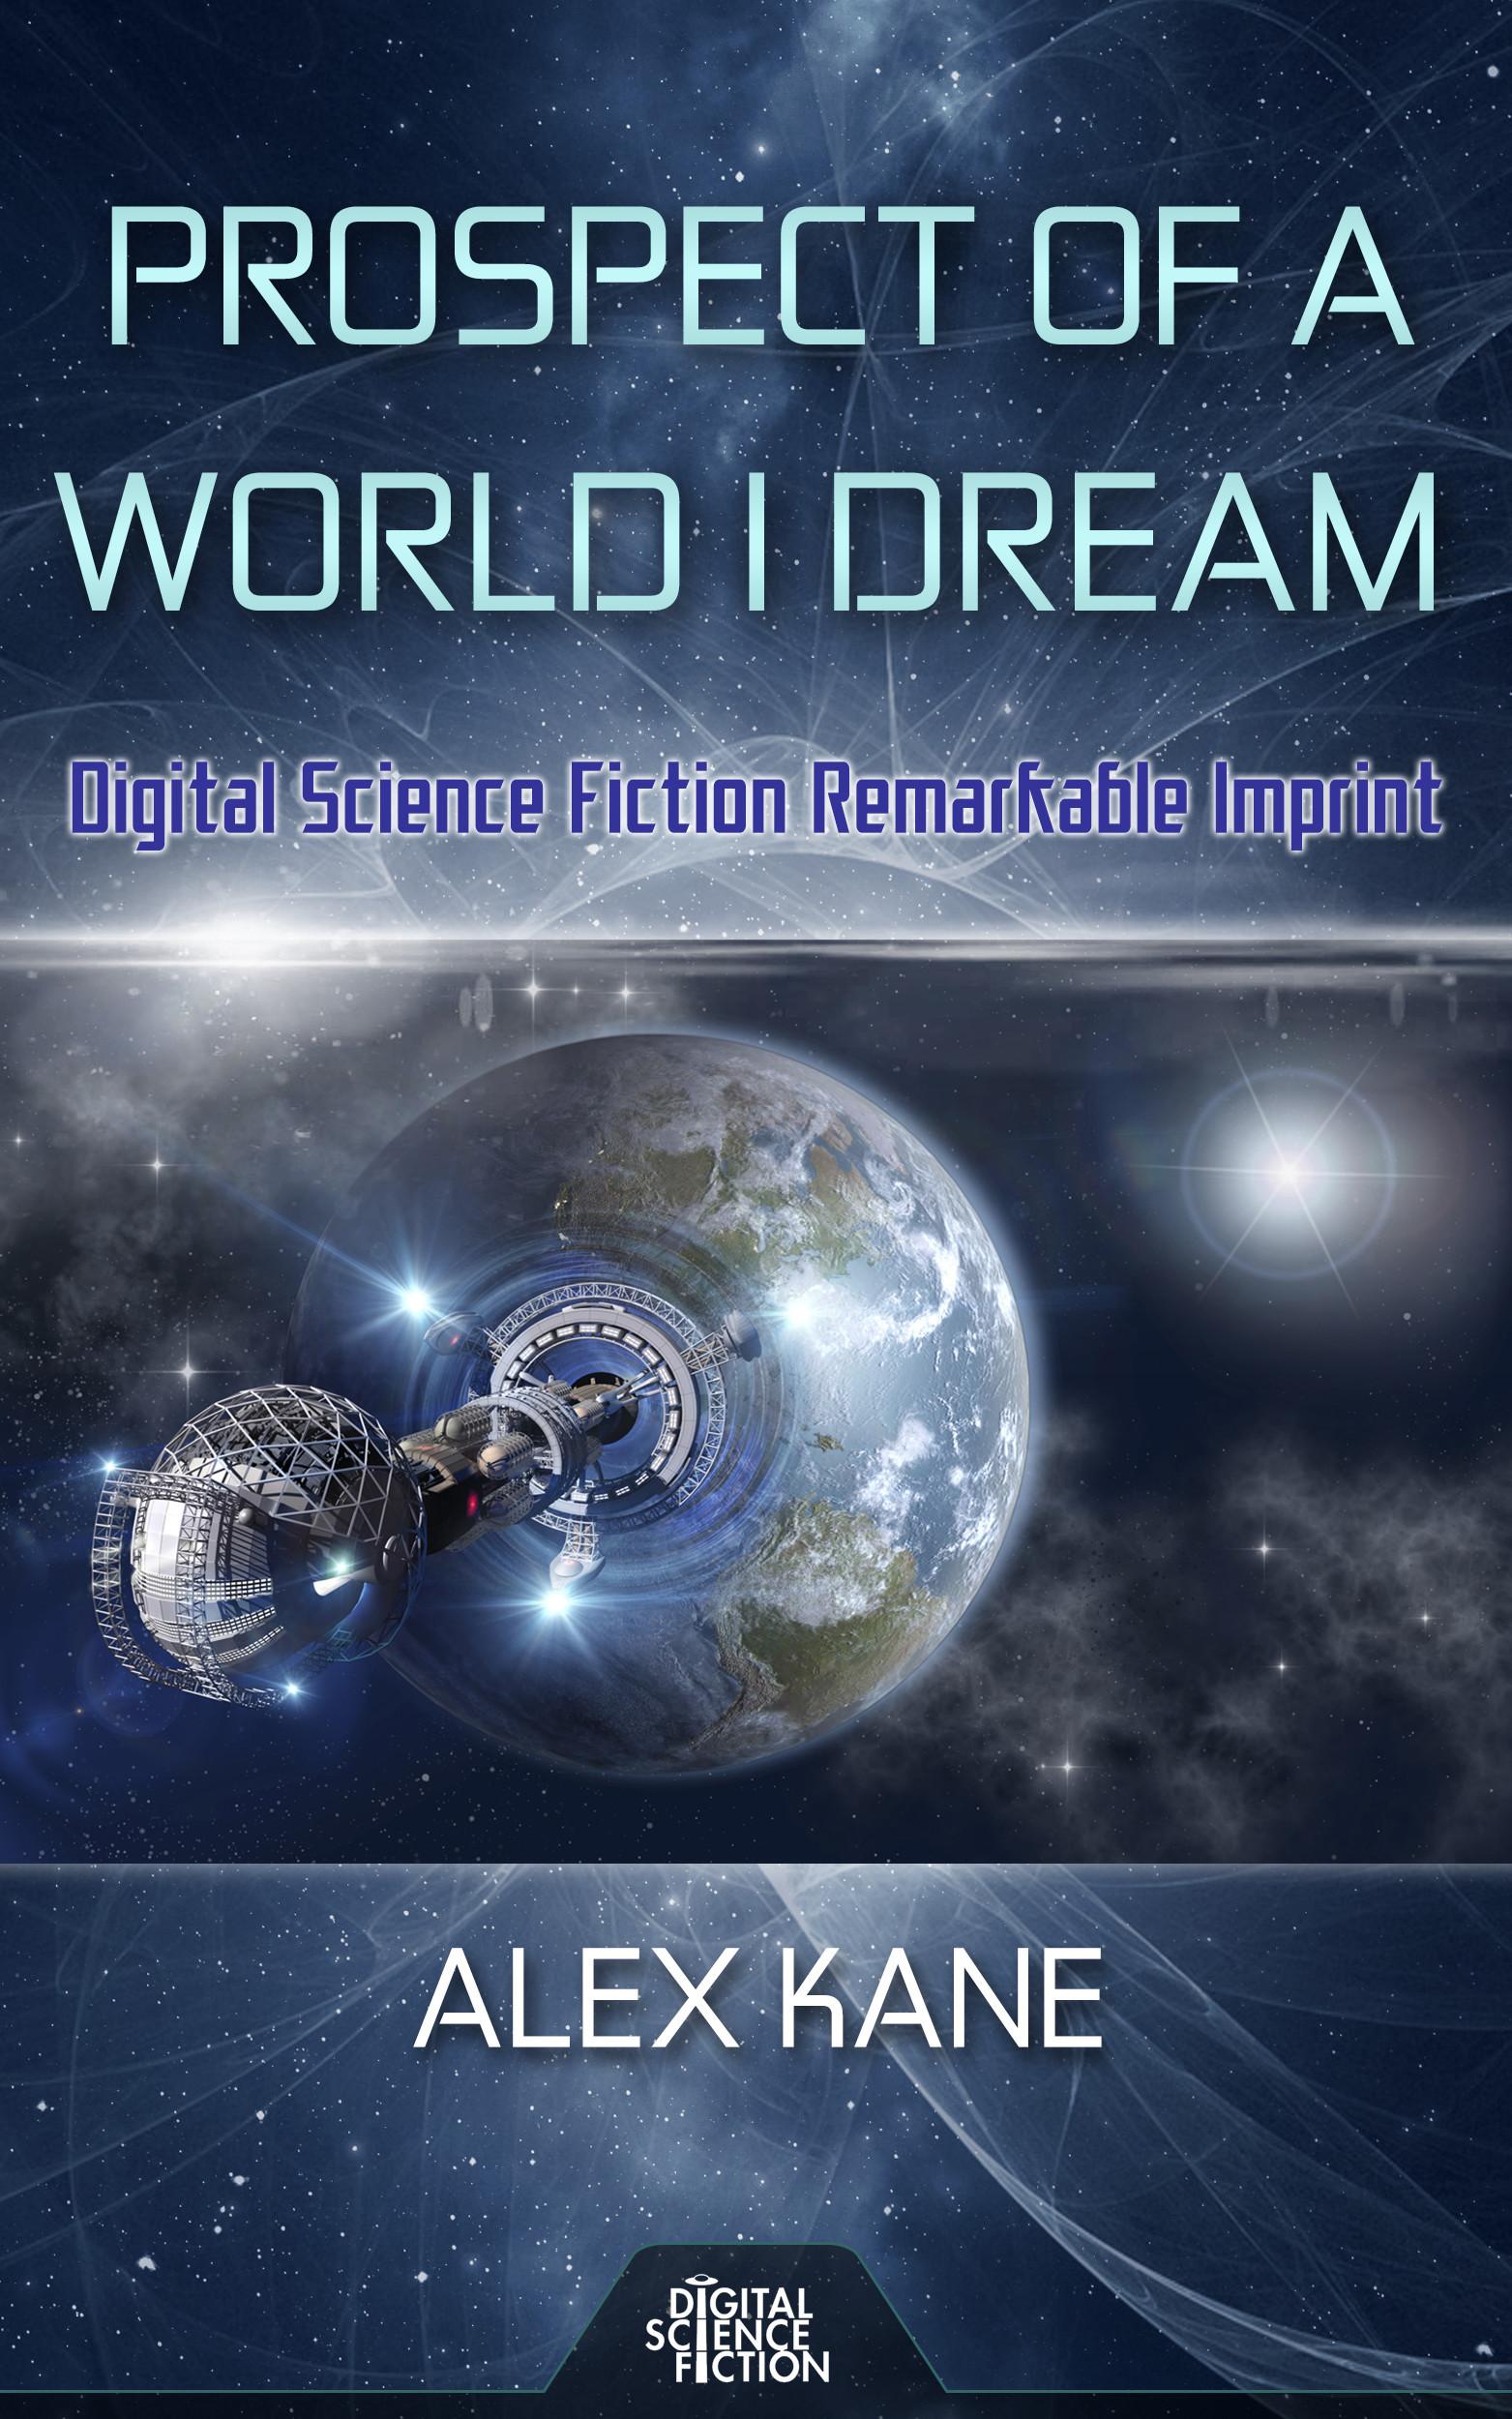 Prospect of a World I Dream - Digital Science Fiction Remarkable Imprint  by  Alex Kane